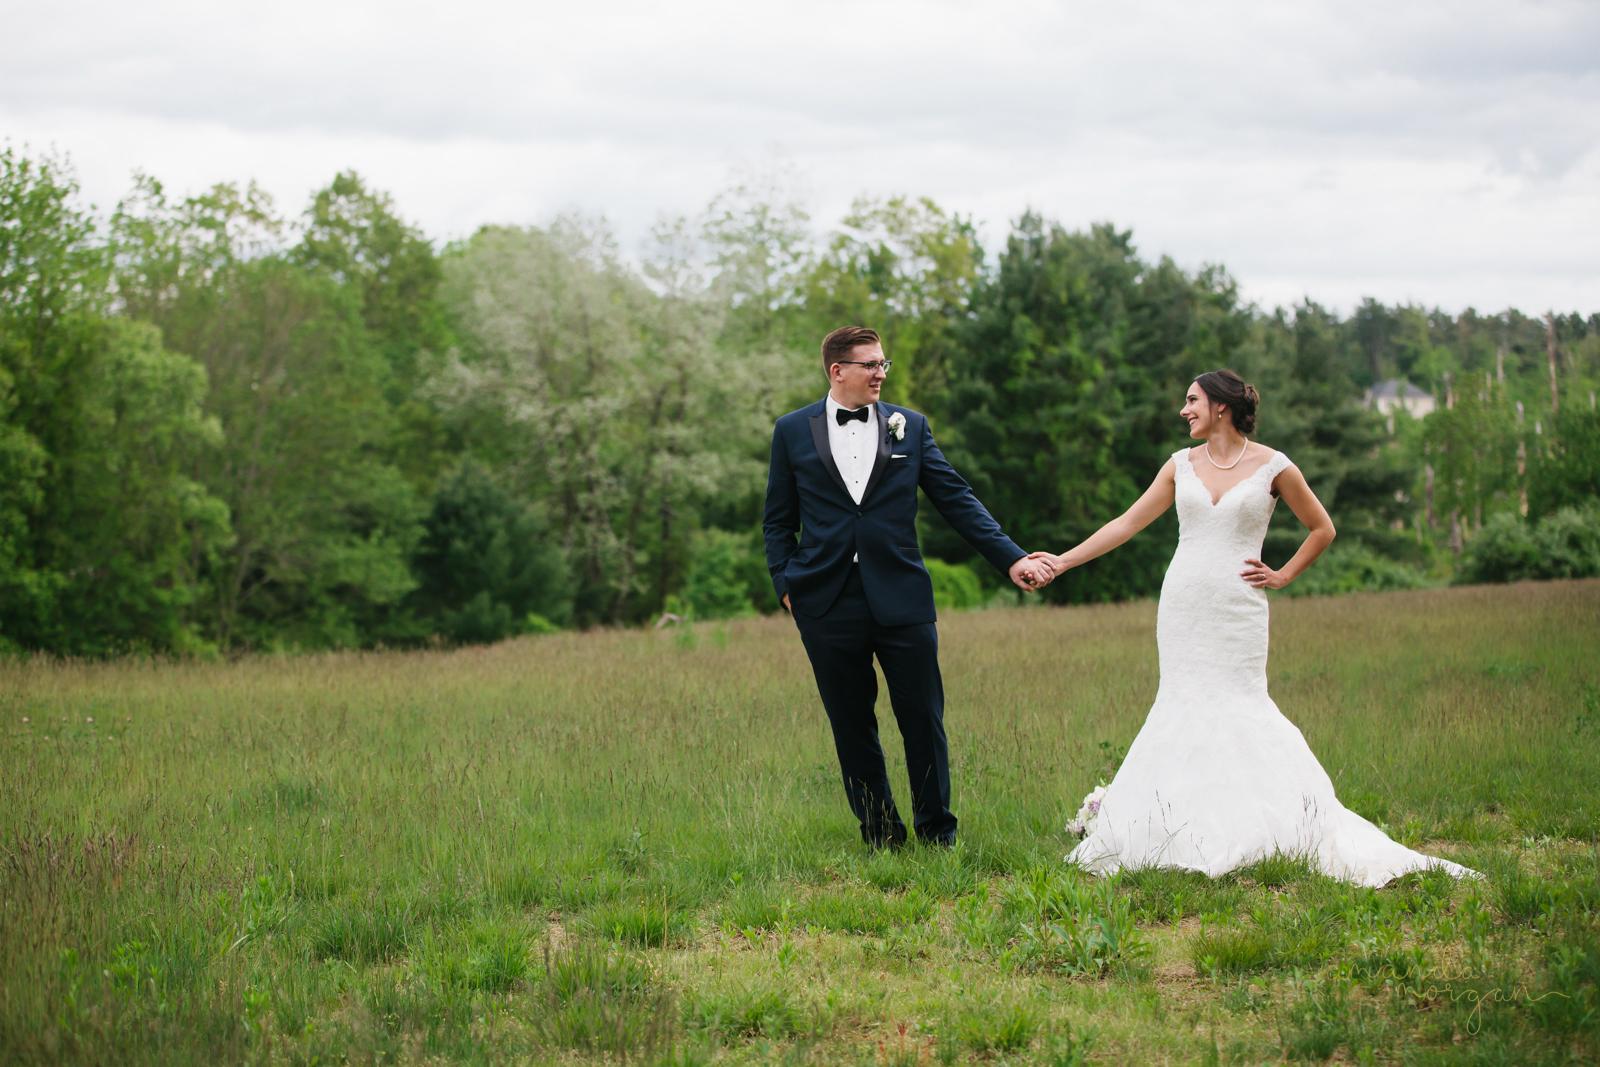 Publick-House-Wedding-Amanda-Morgan-19.jpg